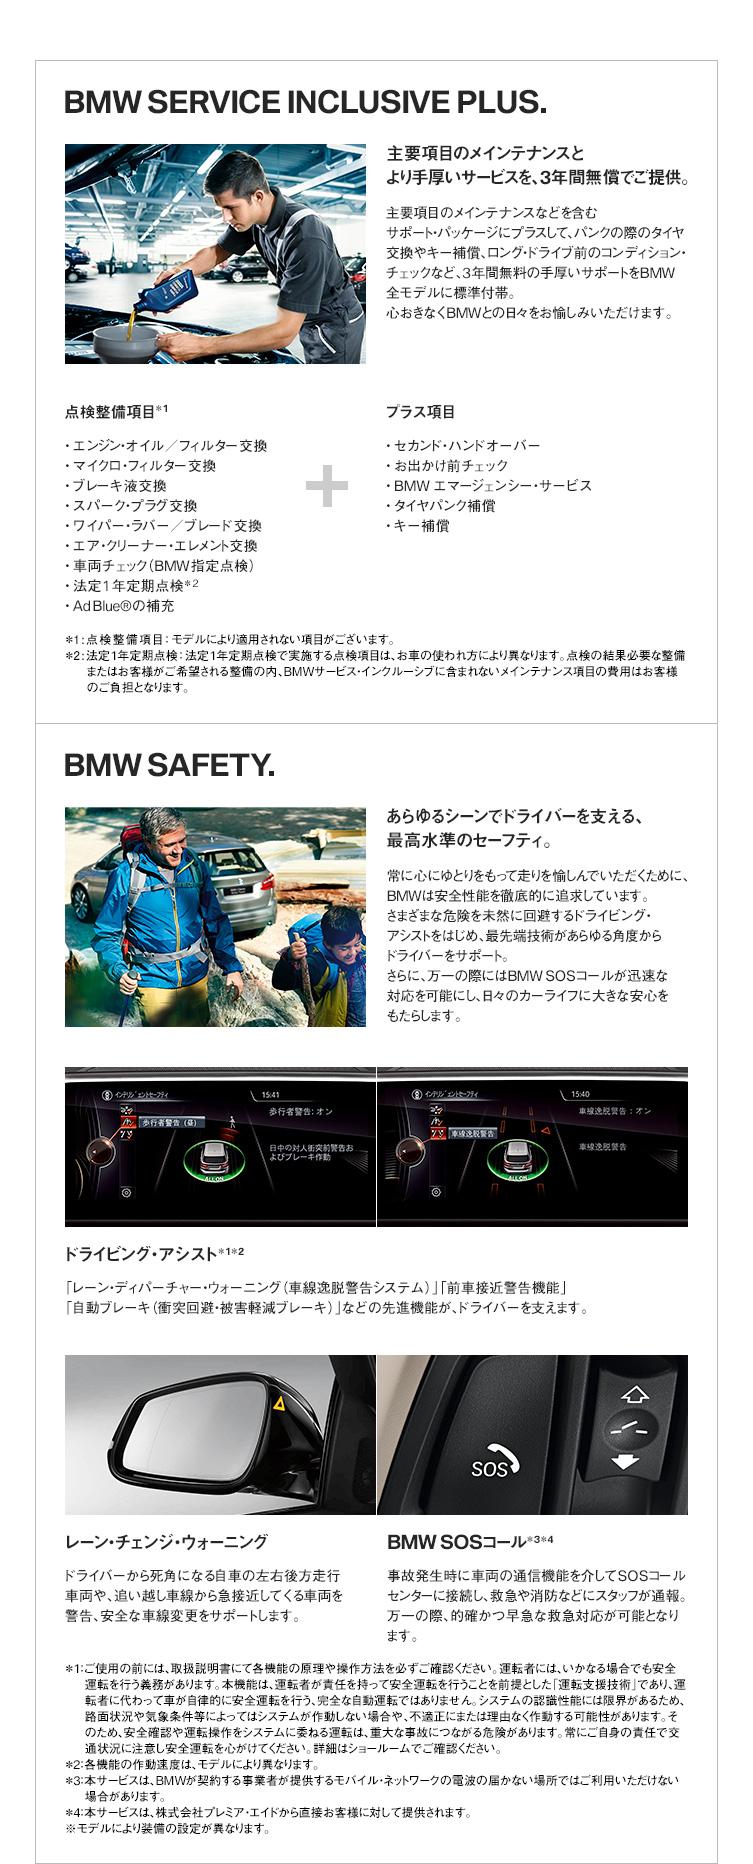 BMW SERVICE INCLUSIVE PLUS. / BMW SAFETY.